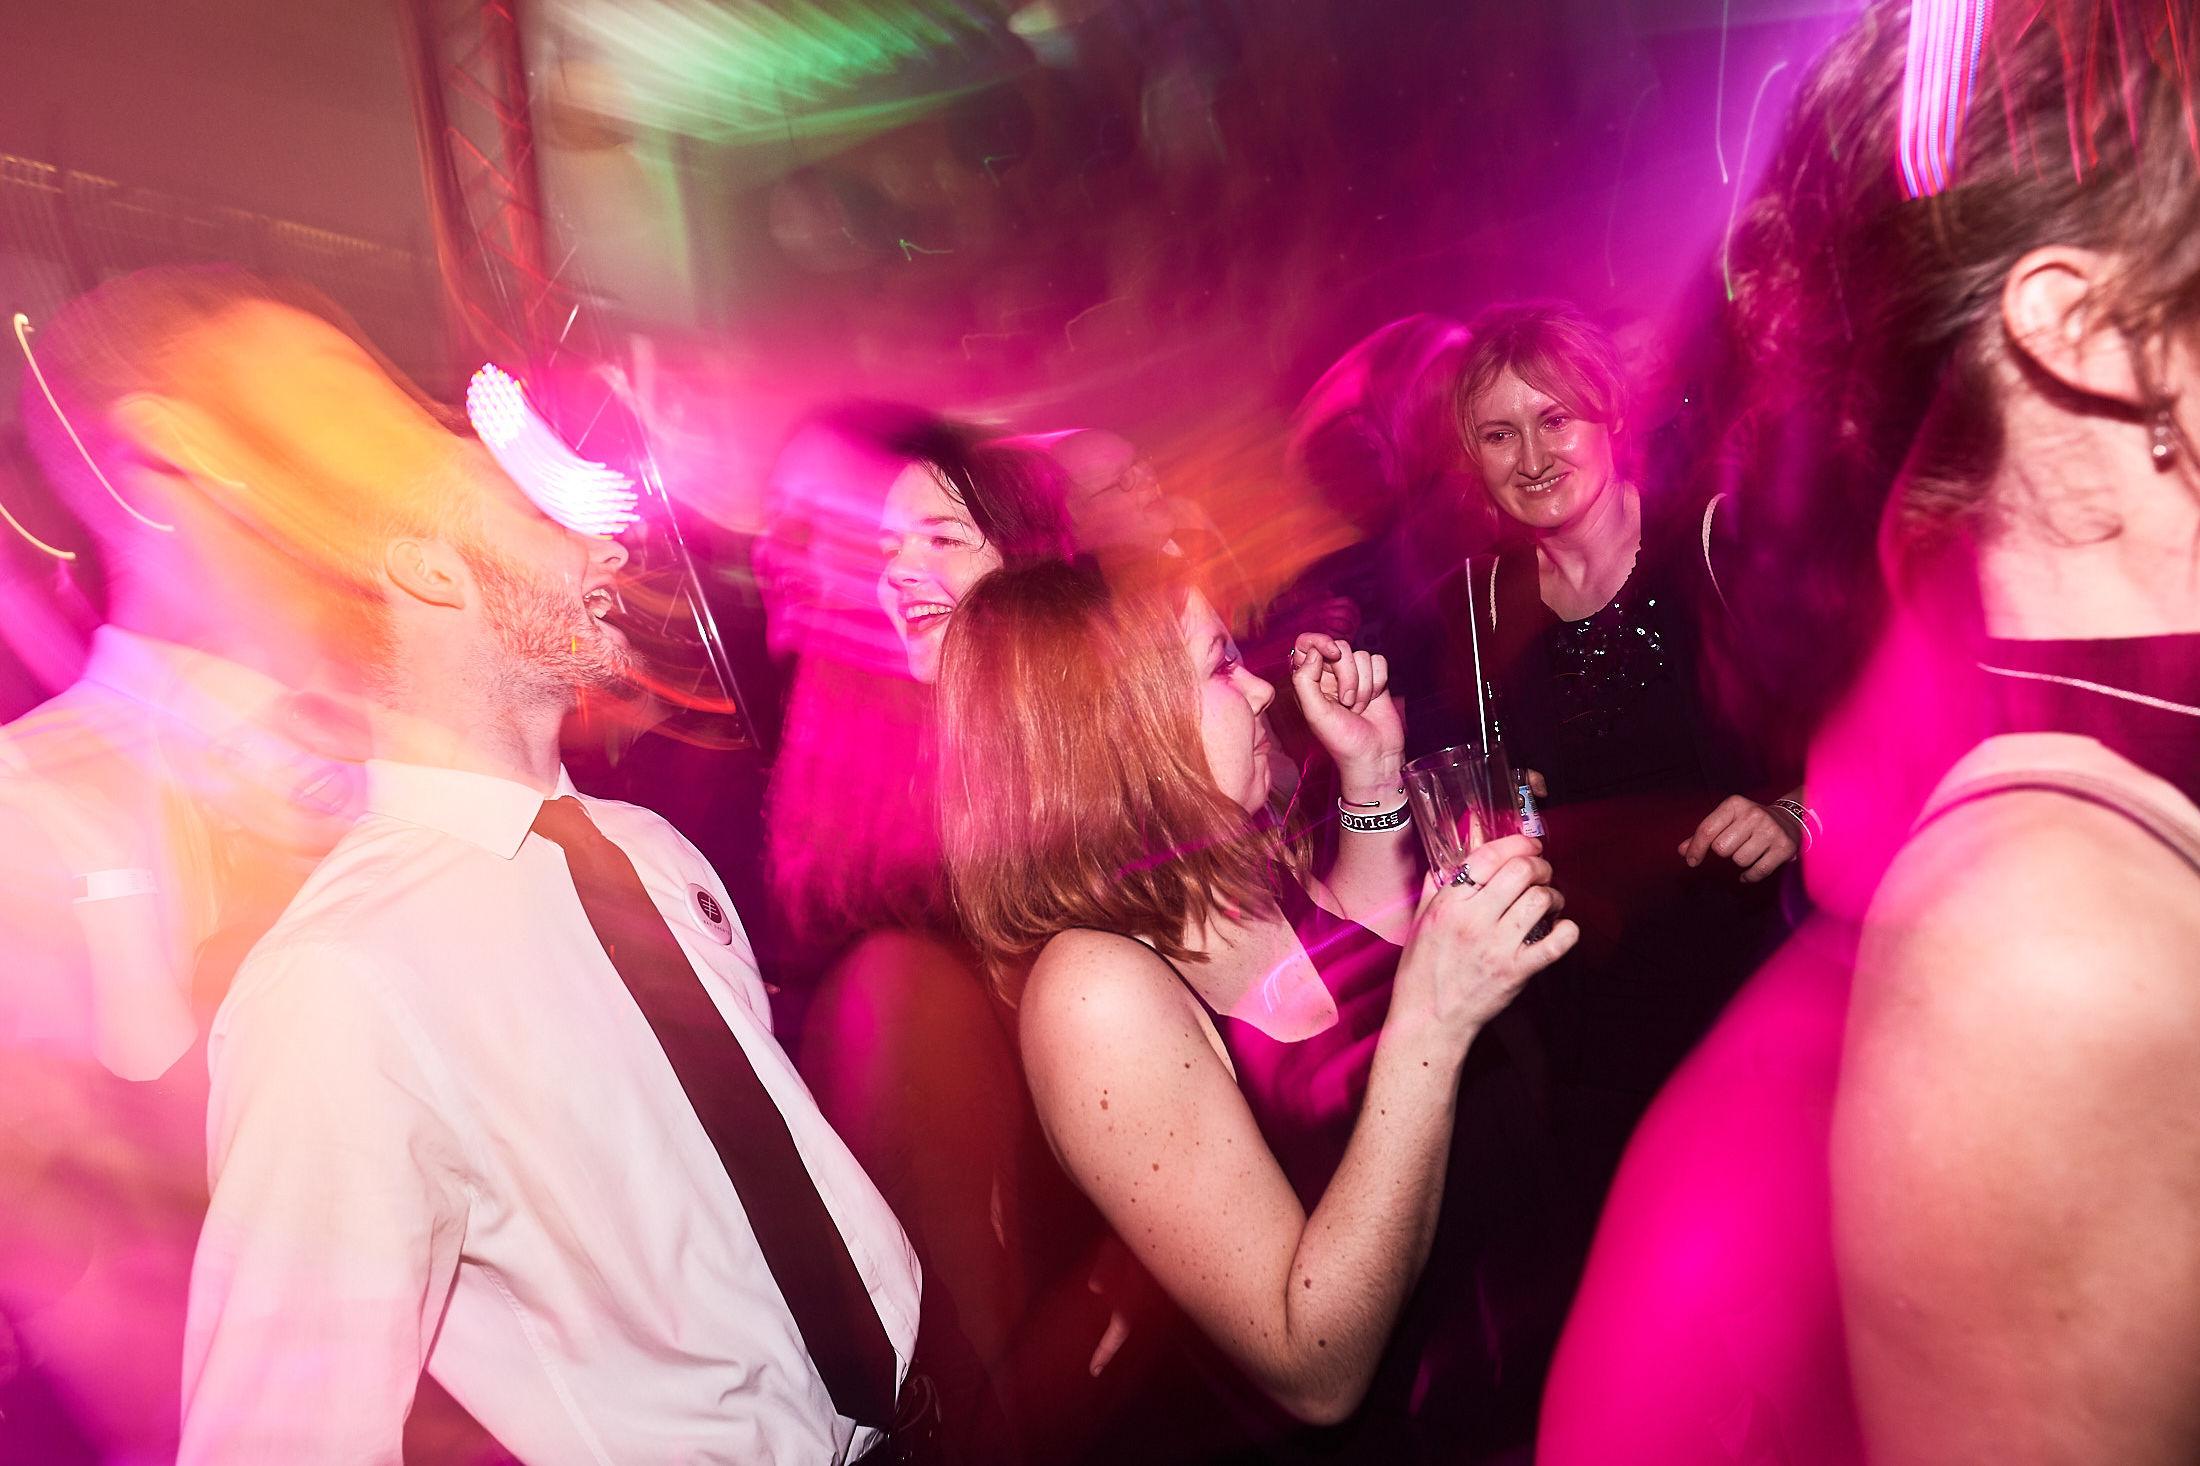 DJ | Hannover | Hochzeits | DJ | Firmenevent | Firmenfeier | DJ | Geburtstag | DJ | Messe | DJ | Sommerfest | Buchen | Mieten | Lehmann | Eventservice